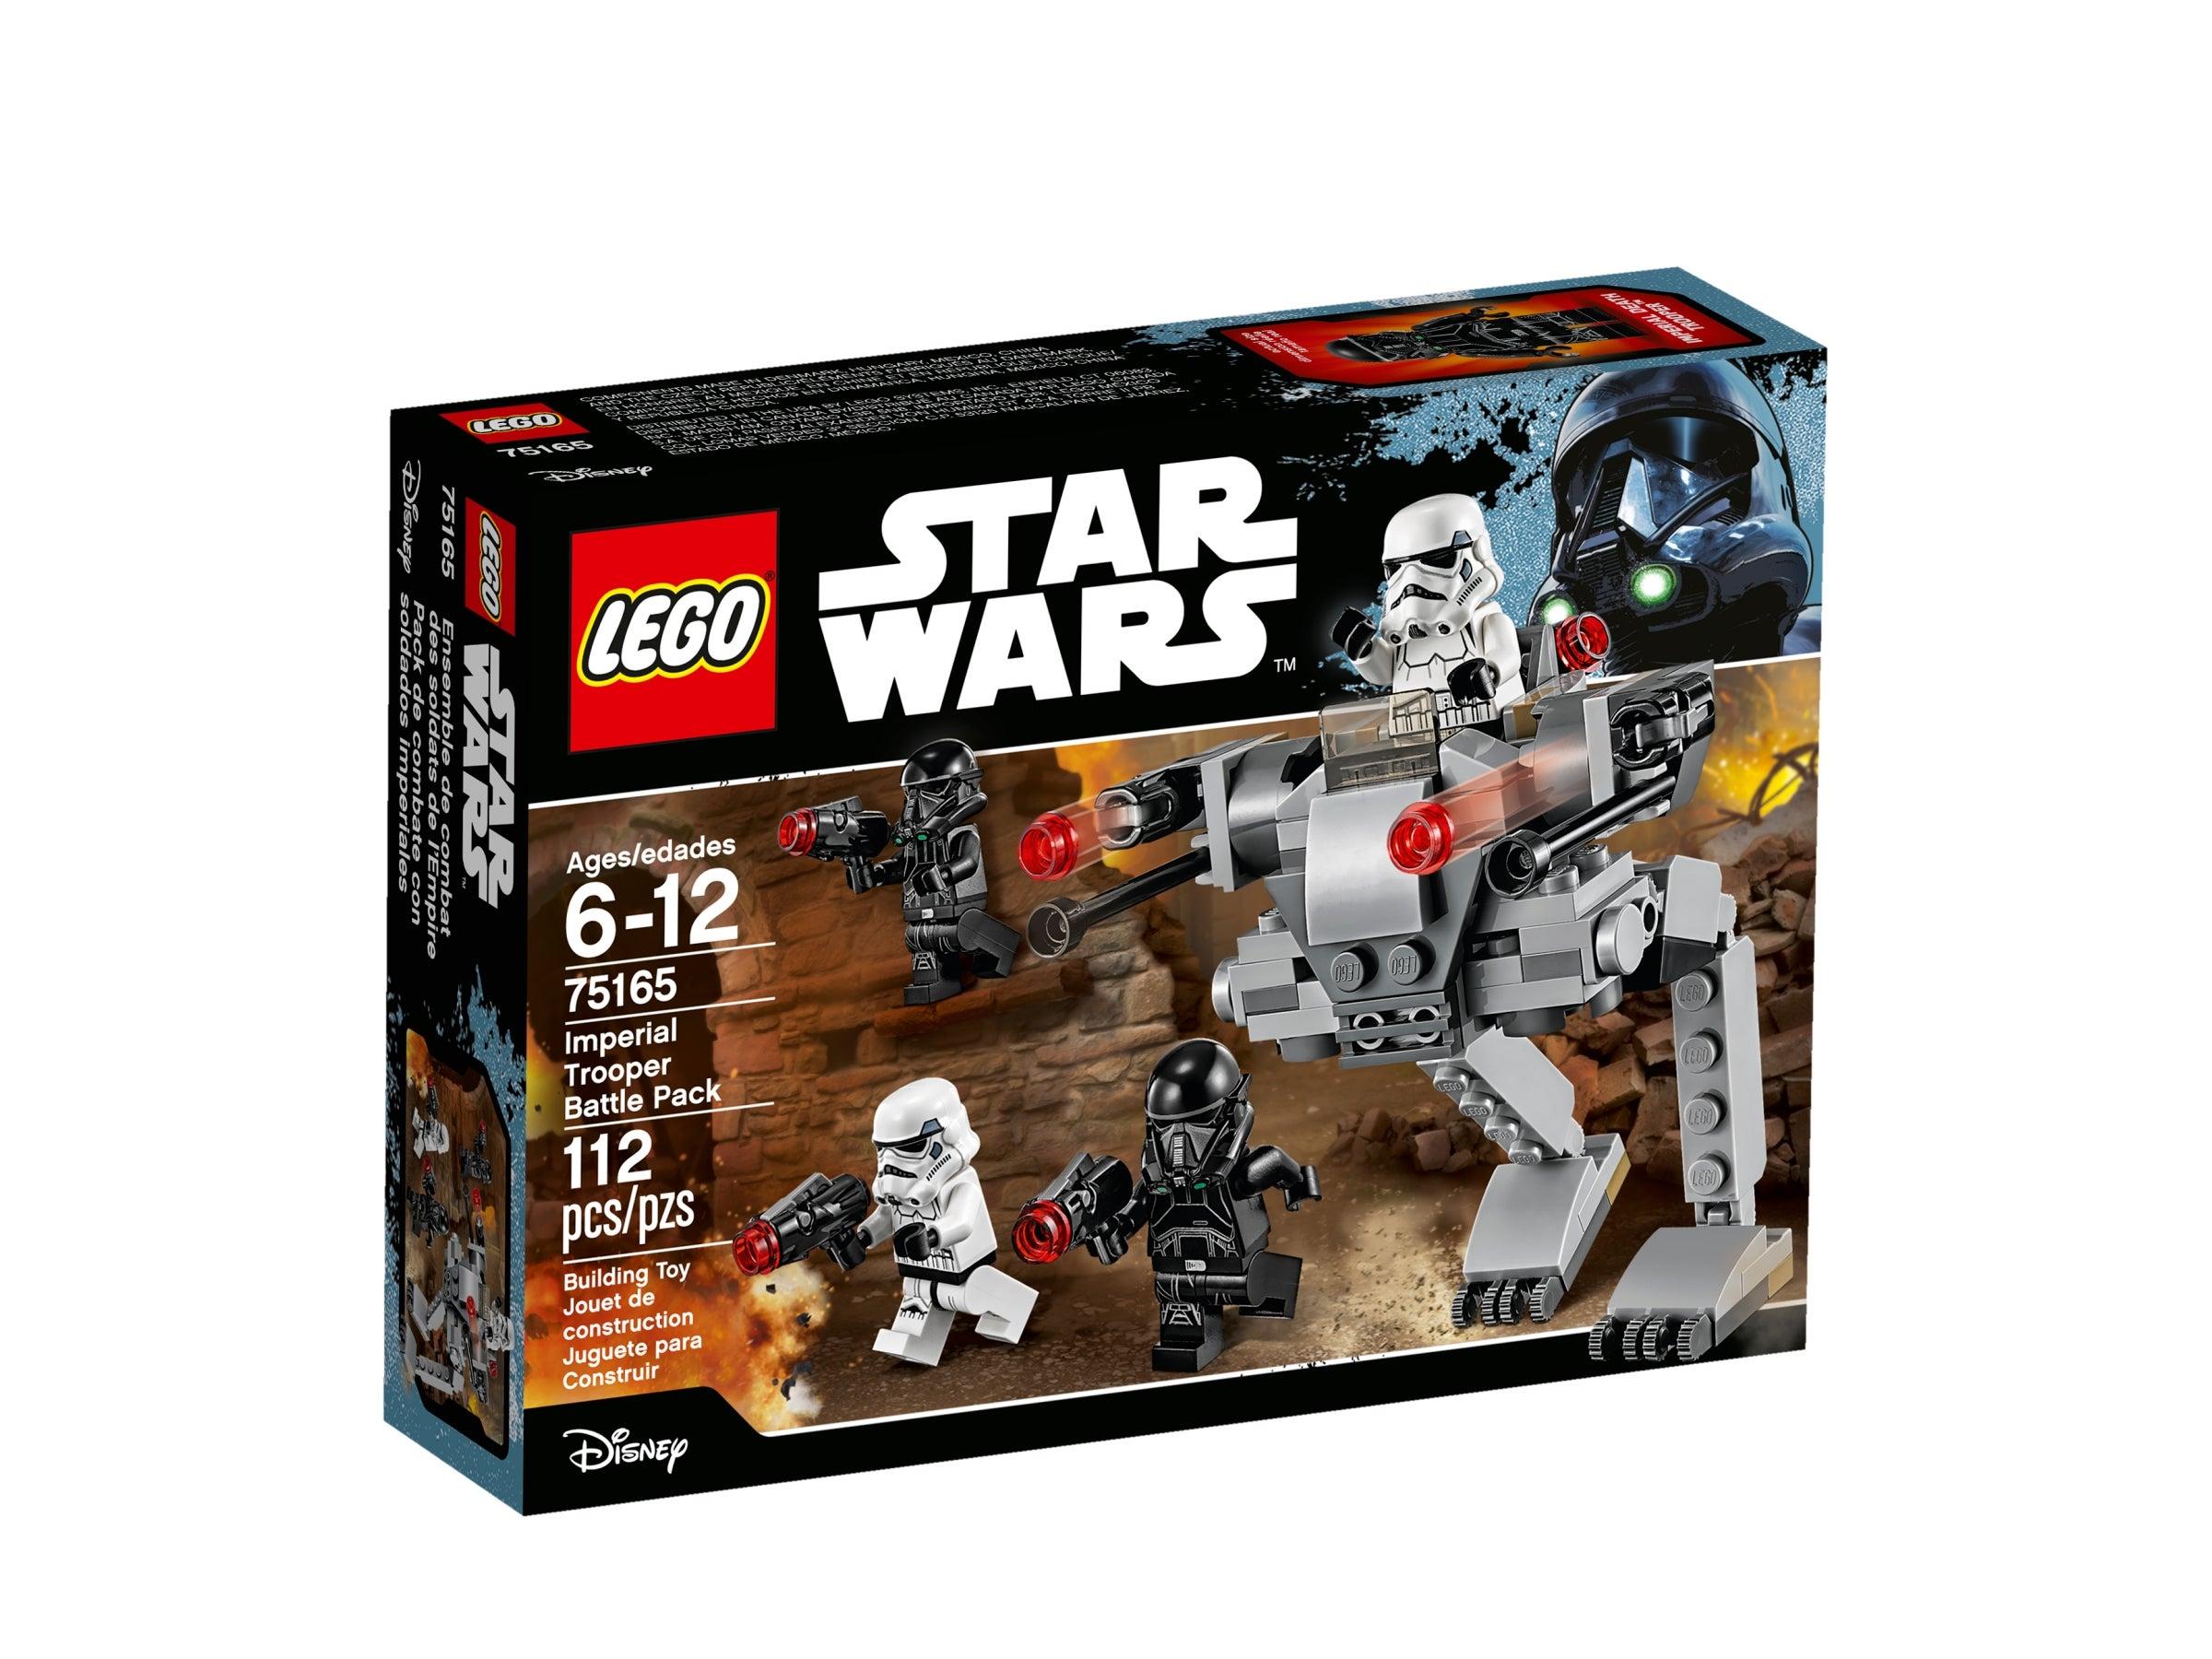 Lego 75146 HOTH REBEL TROOPER star wars FACTORY SEALED rare SW765